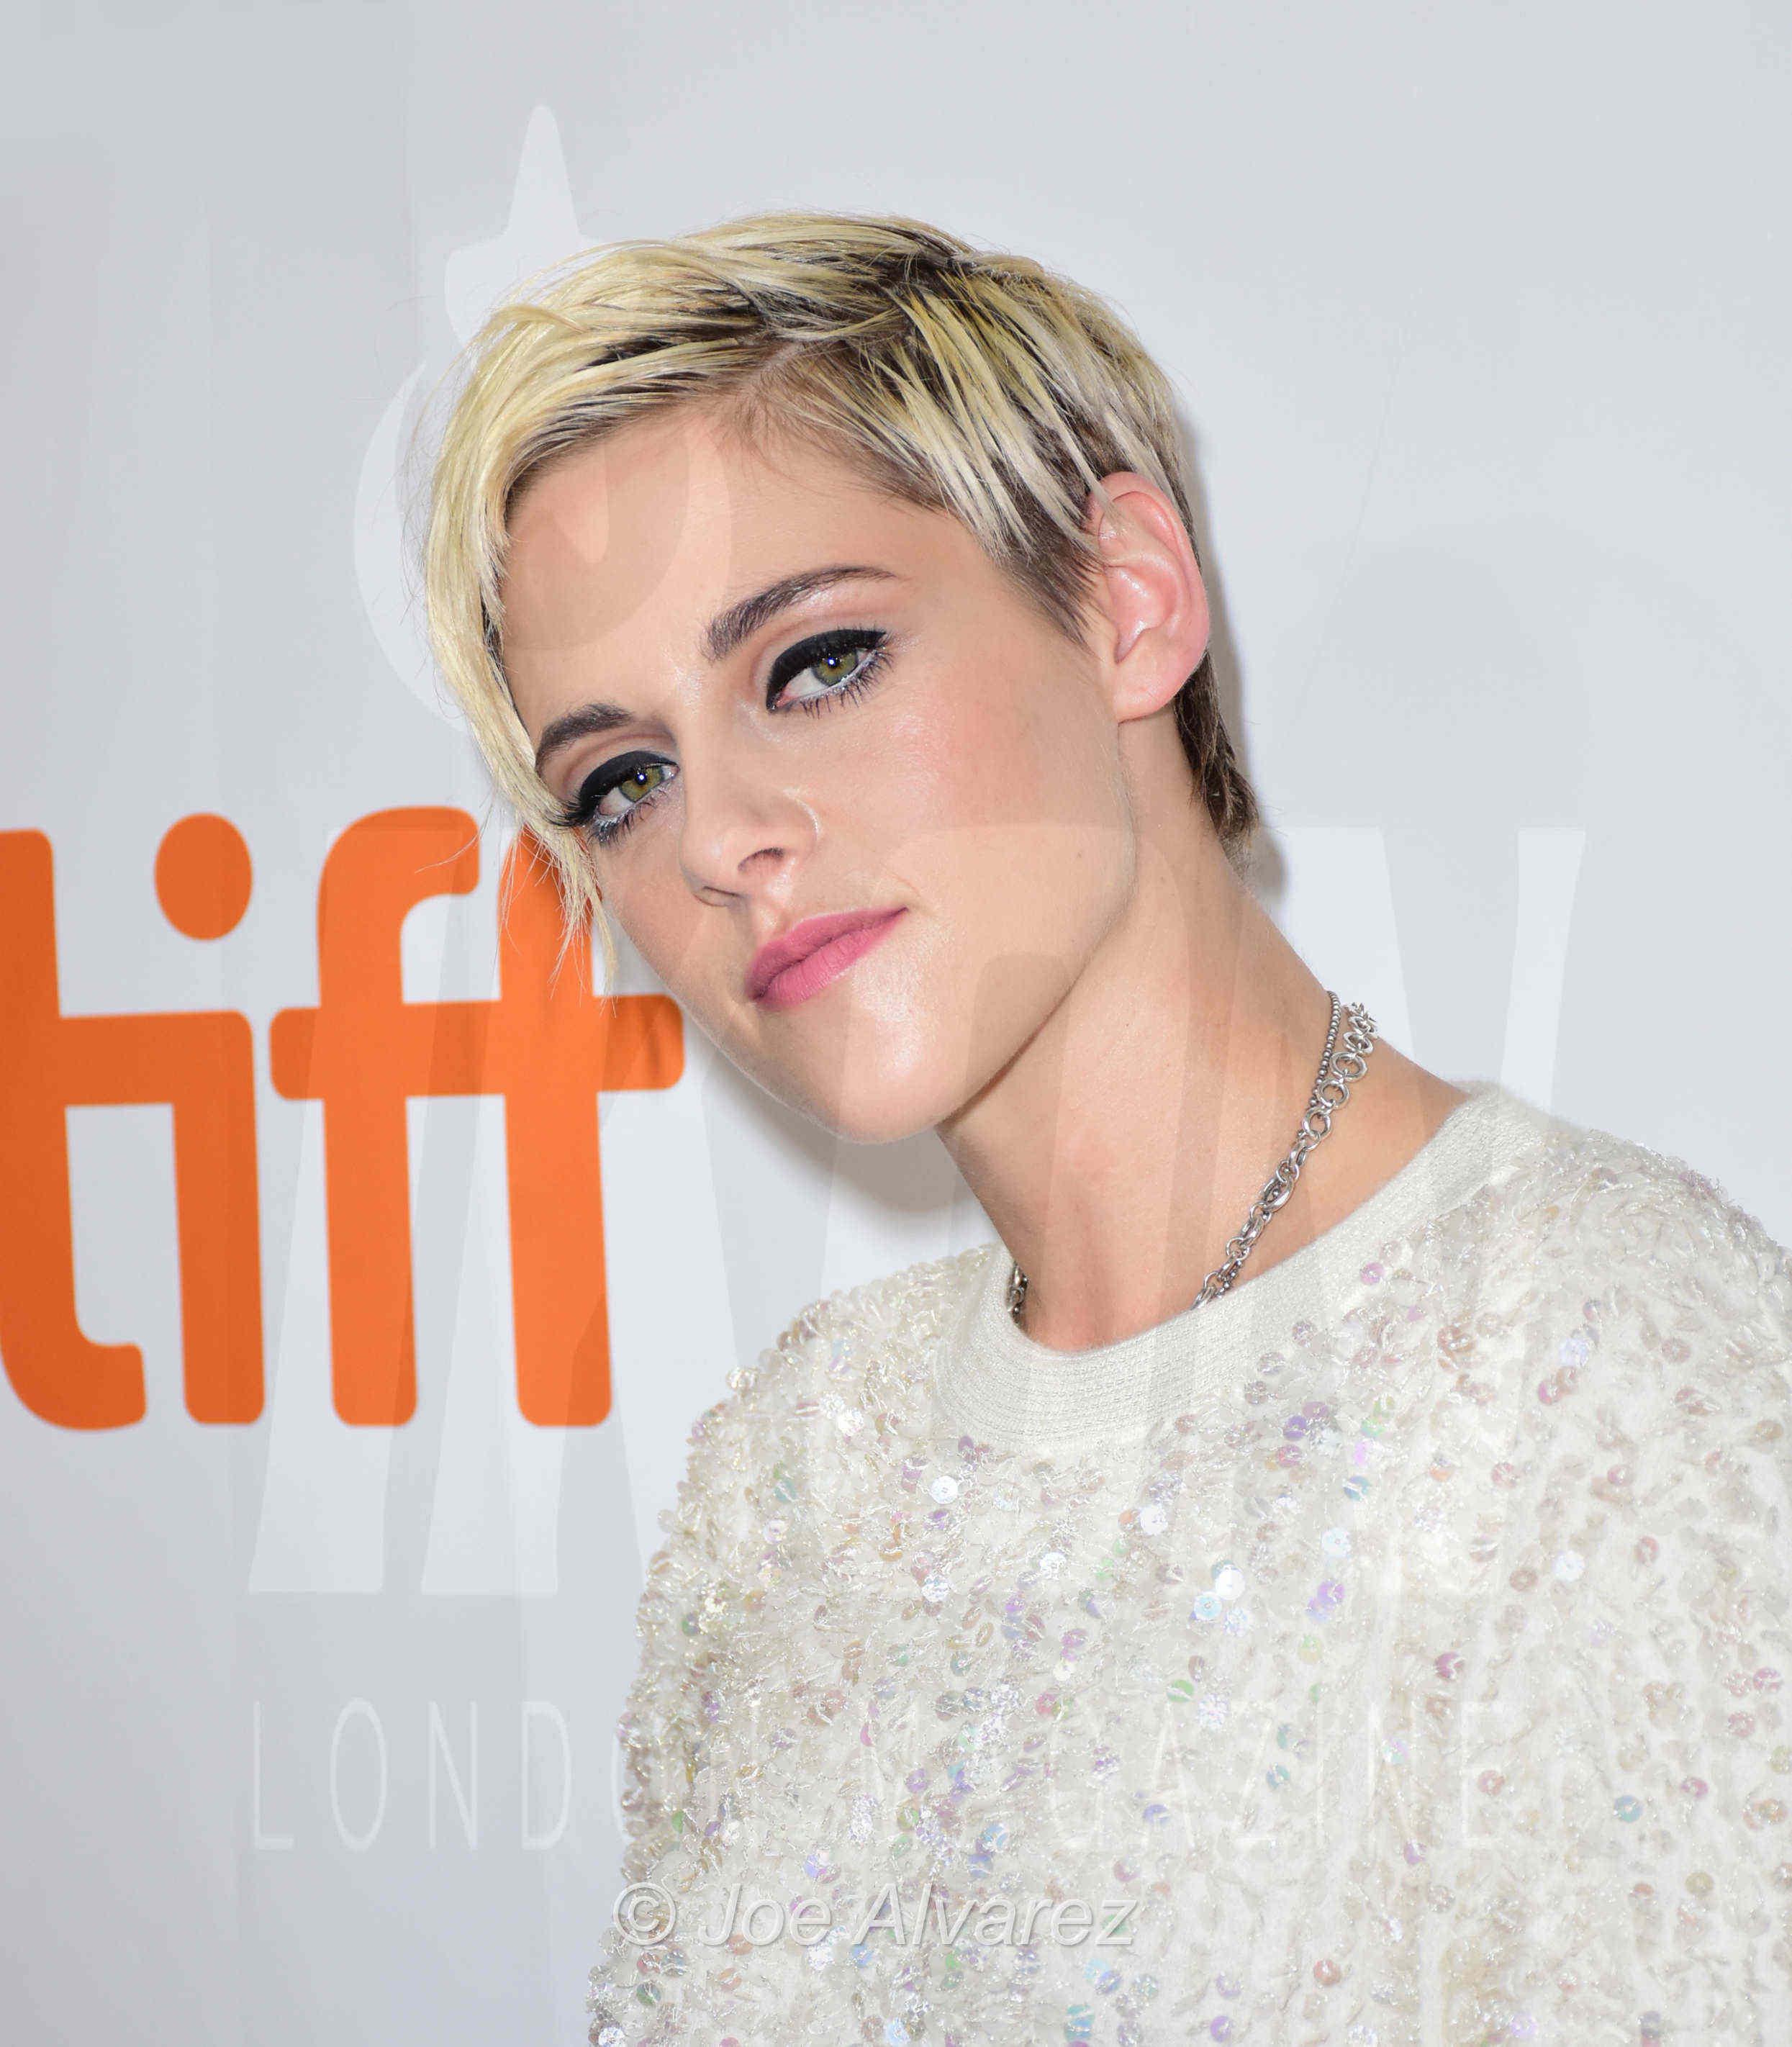 Kristen Stewart Jeremiah Terminator LeRoy at the Toronto premiere © Joe Alvarez